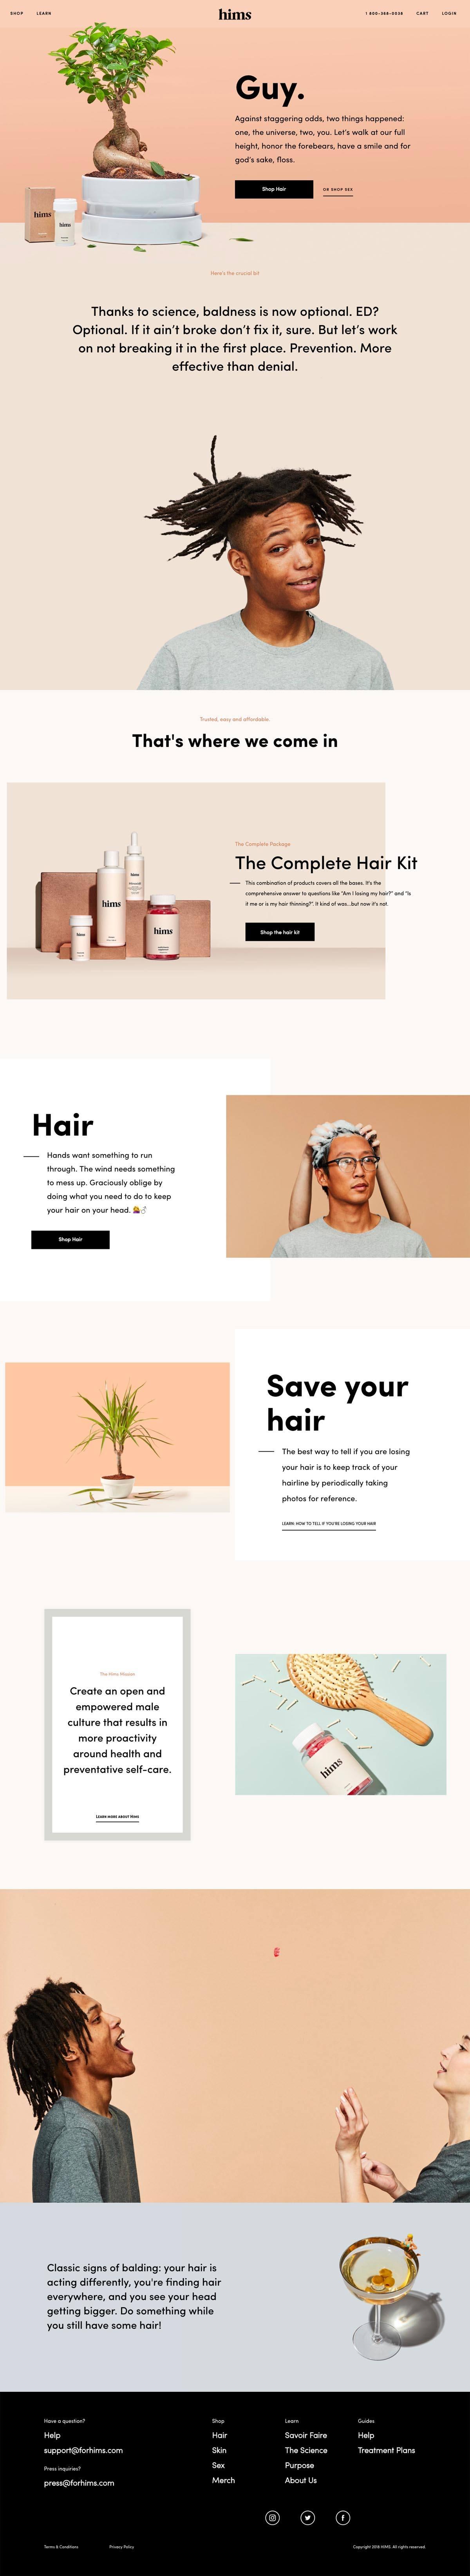 eCommerce website: hims